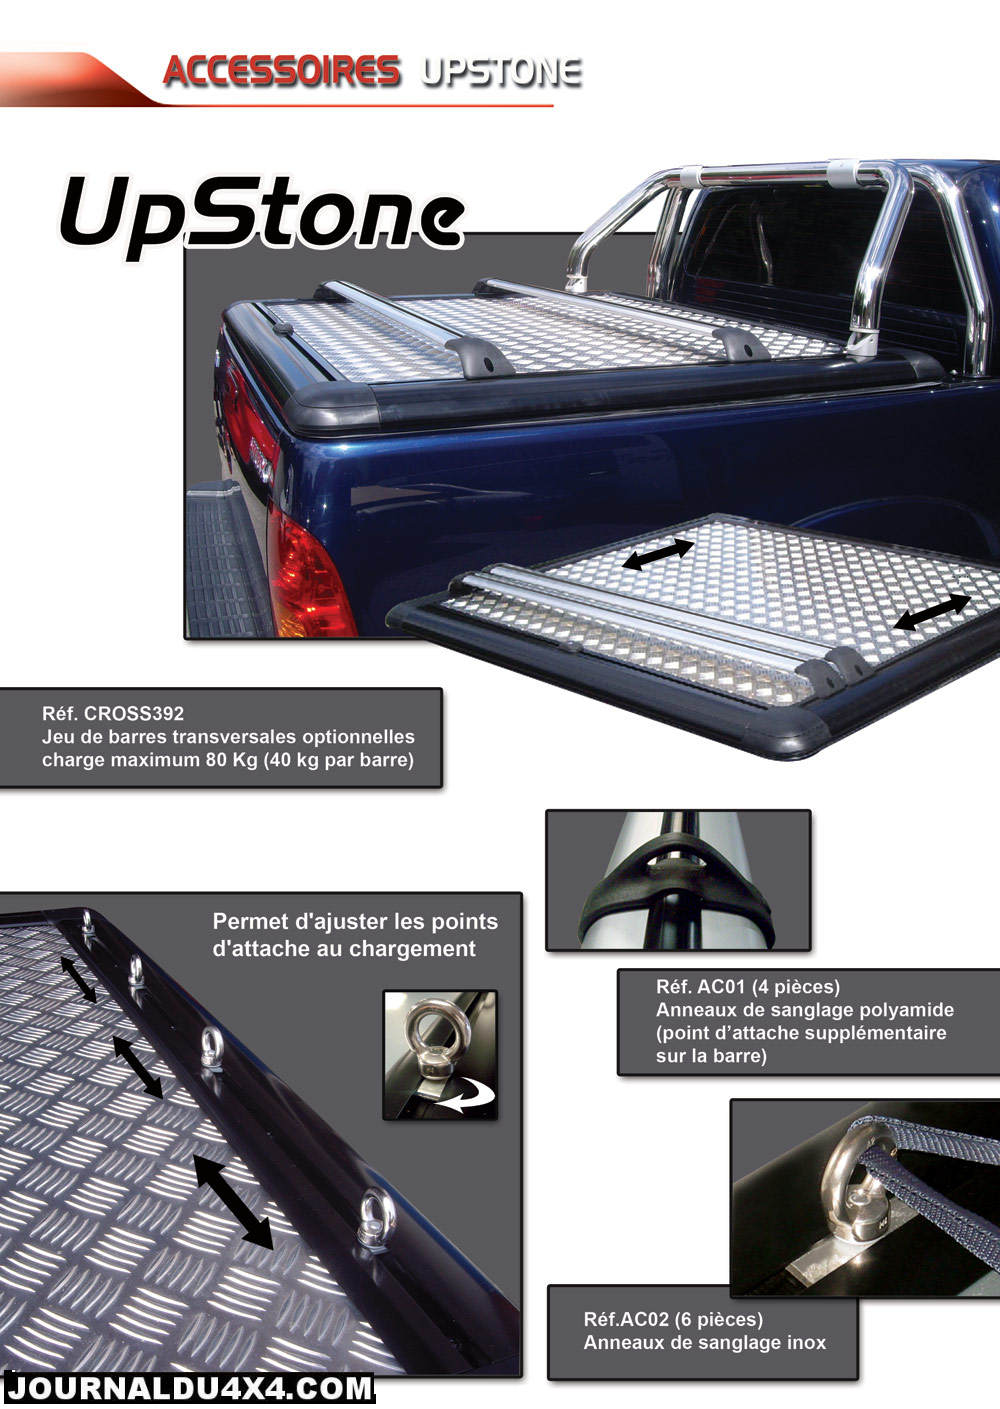 Accessoires-Upstone.jpg